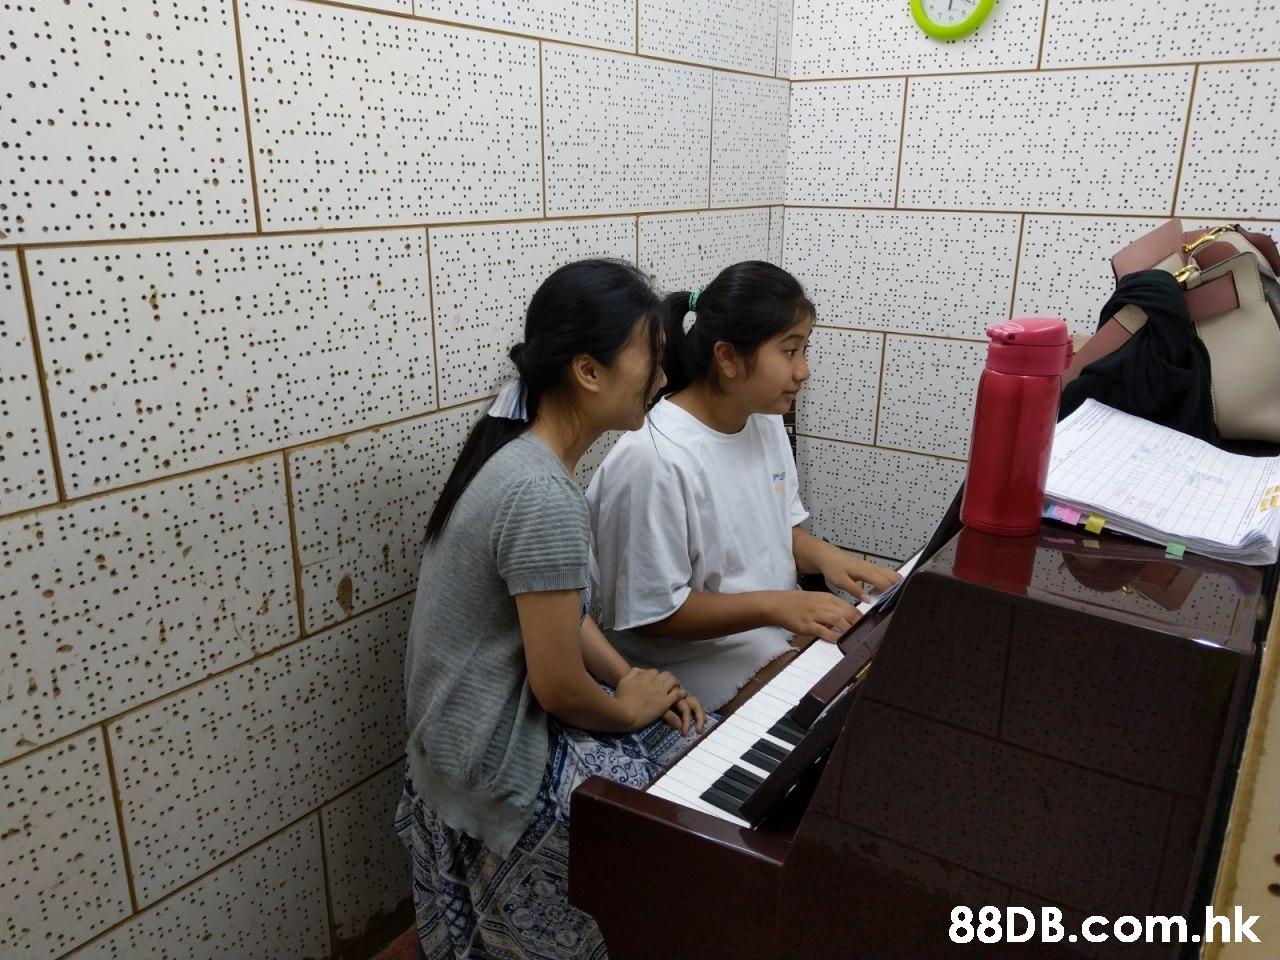 .hk ..  Musical keyboard,Room,Pianist,Technology,Keyboard player